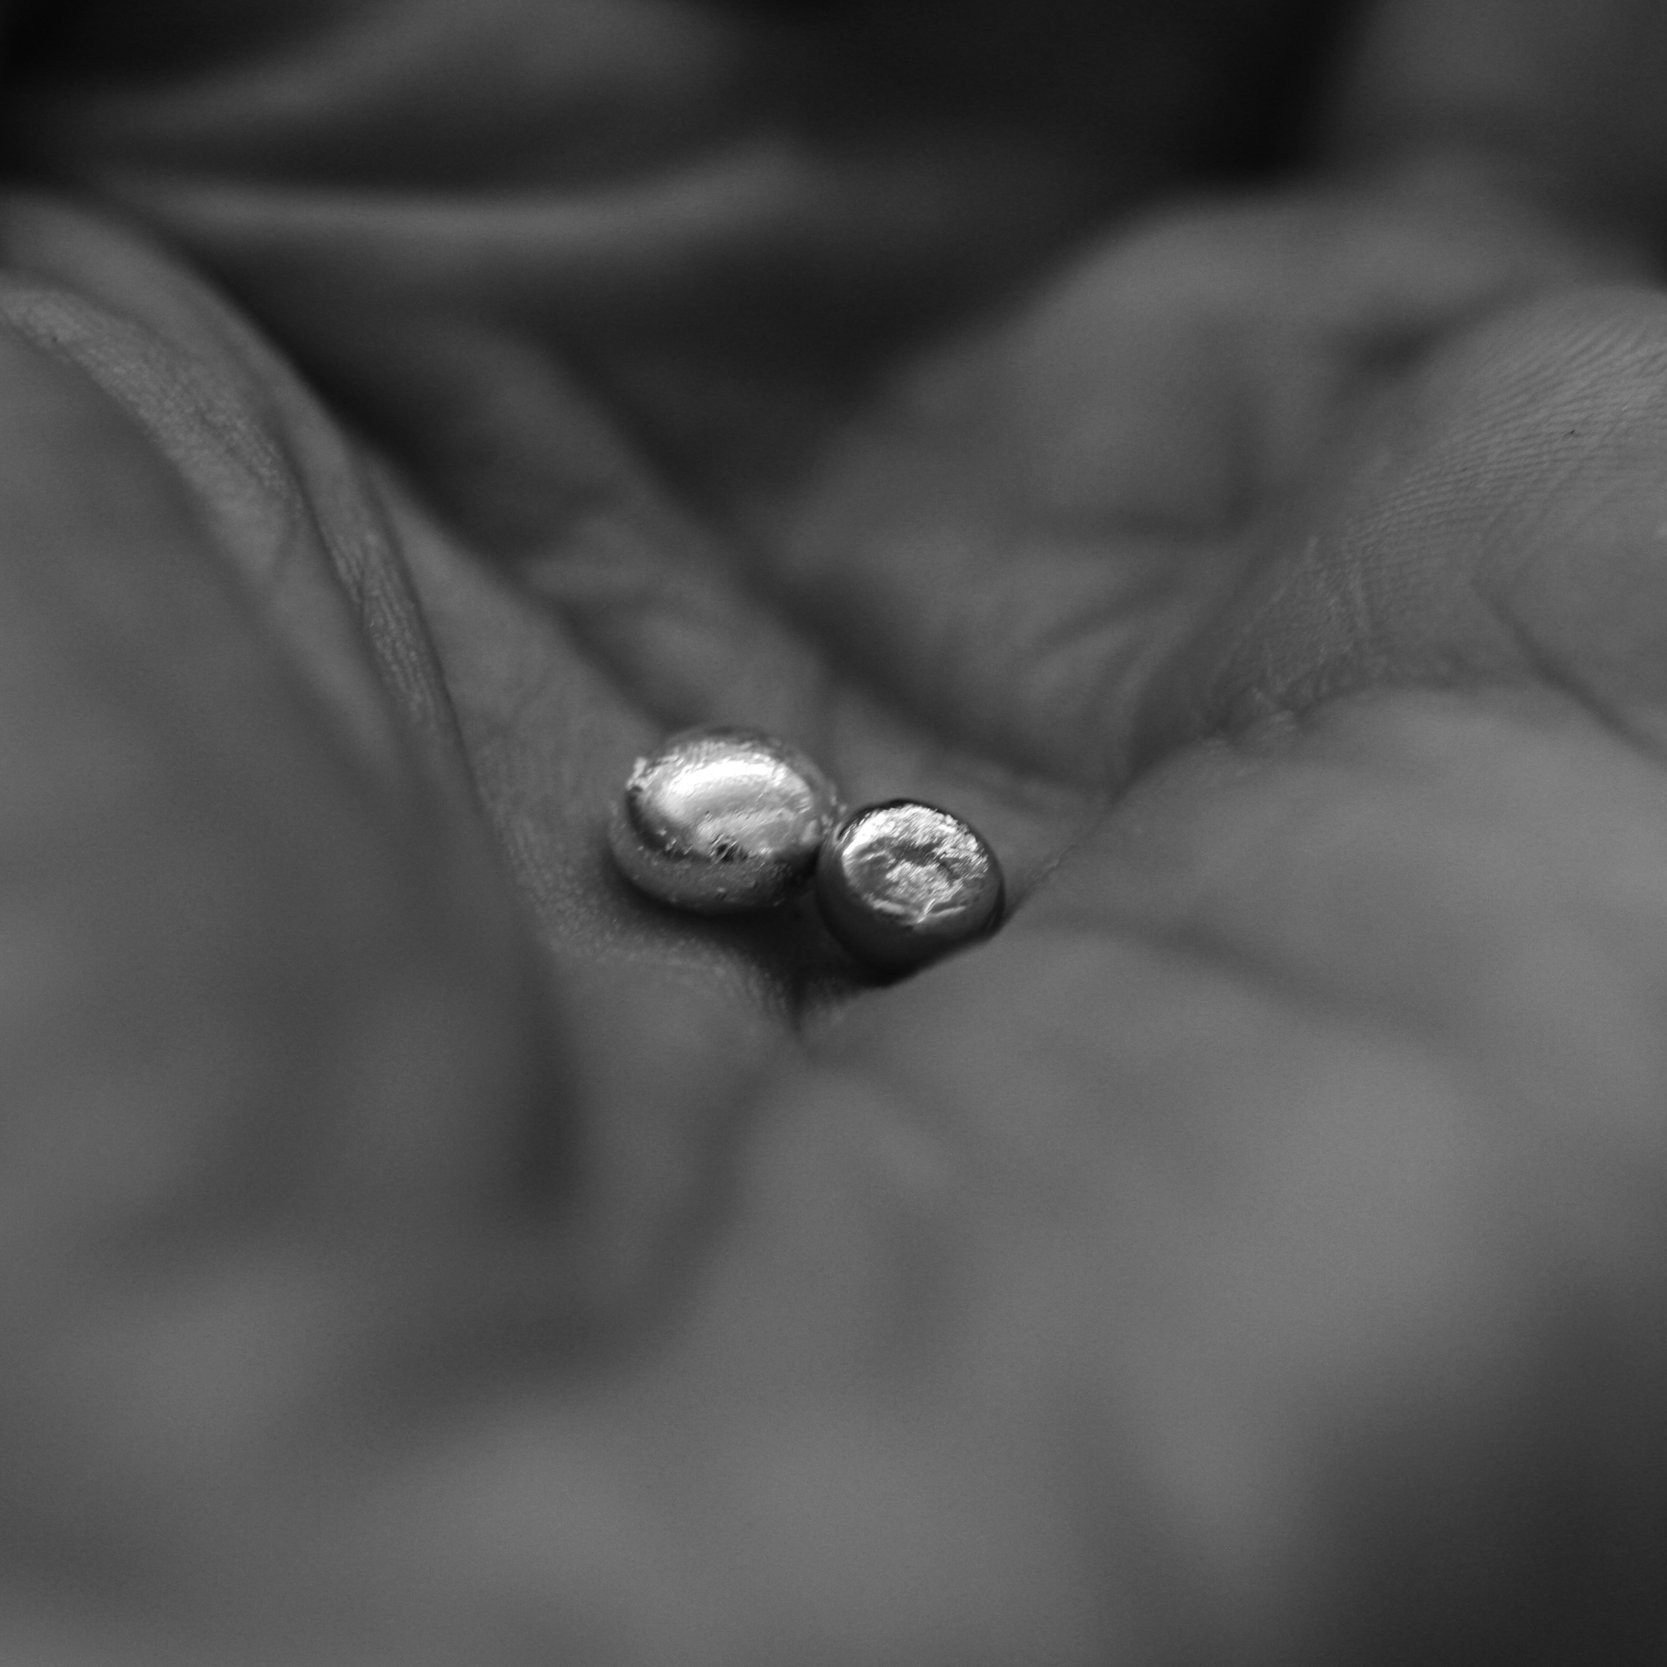 Gold & Silver in Hand.jpg